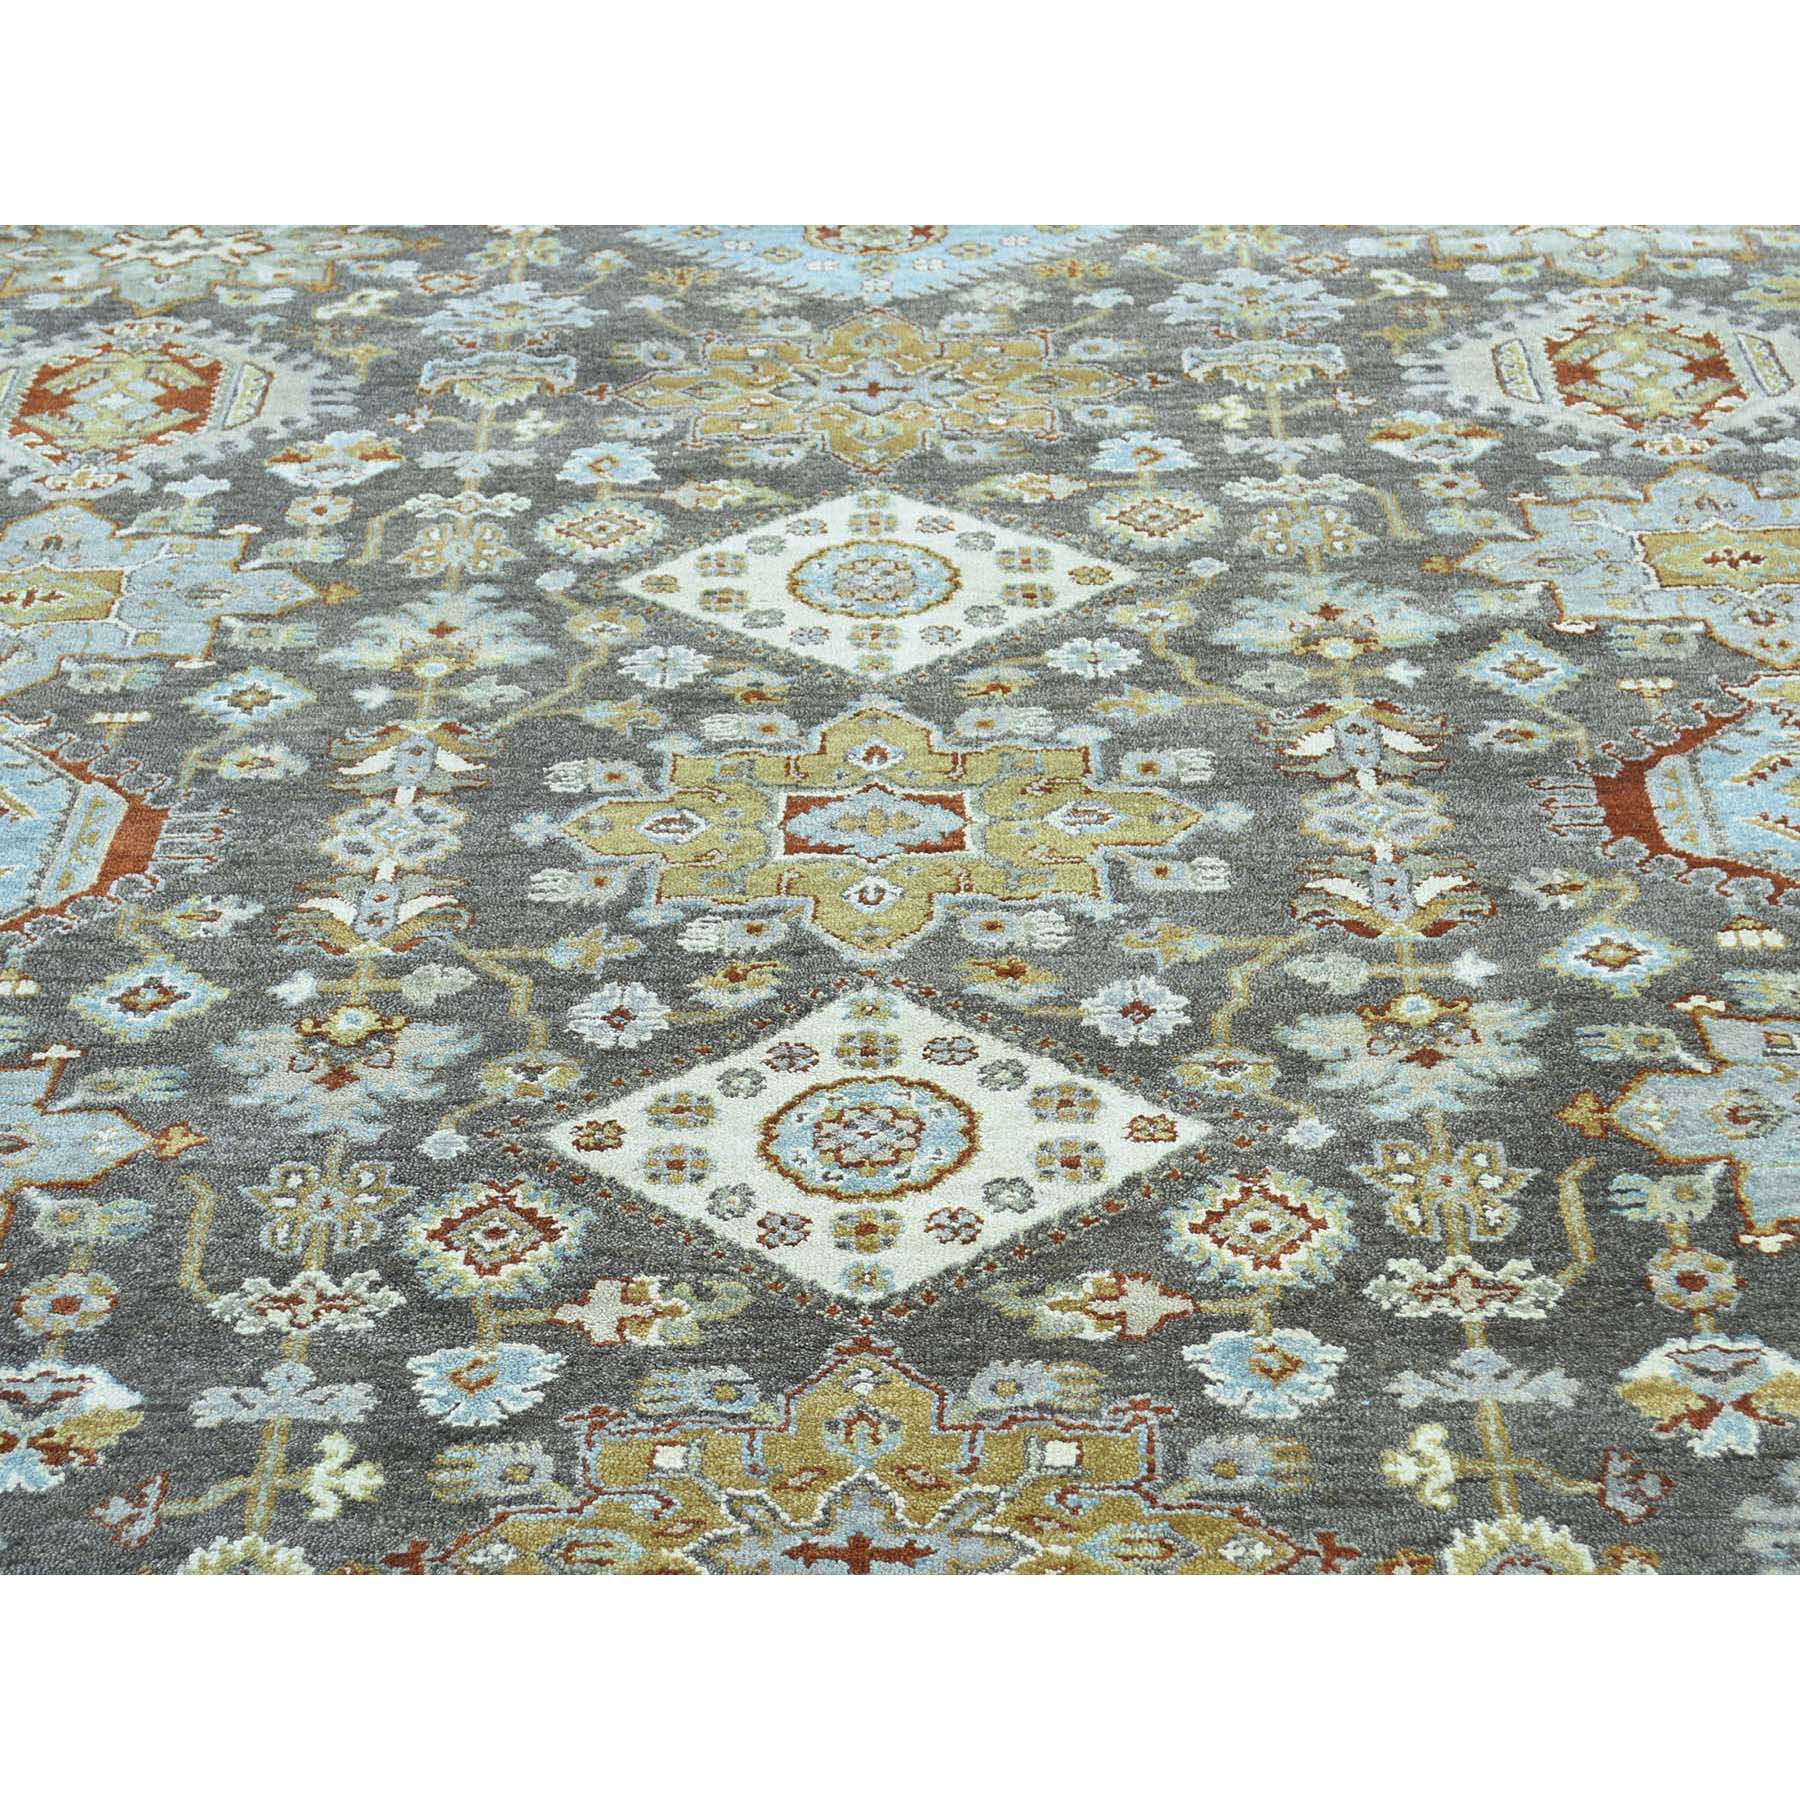 10-x13-9  Hand-Knotted Pure Wool Karajeh Design Oriental Rug